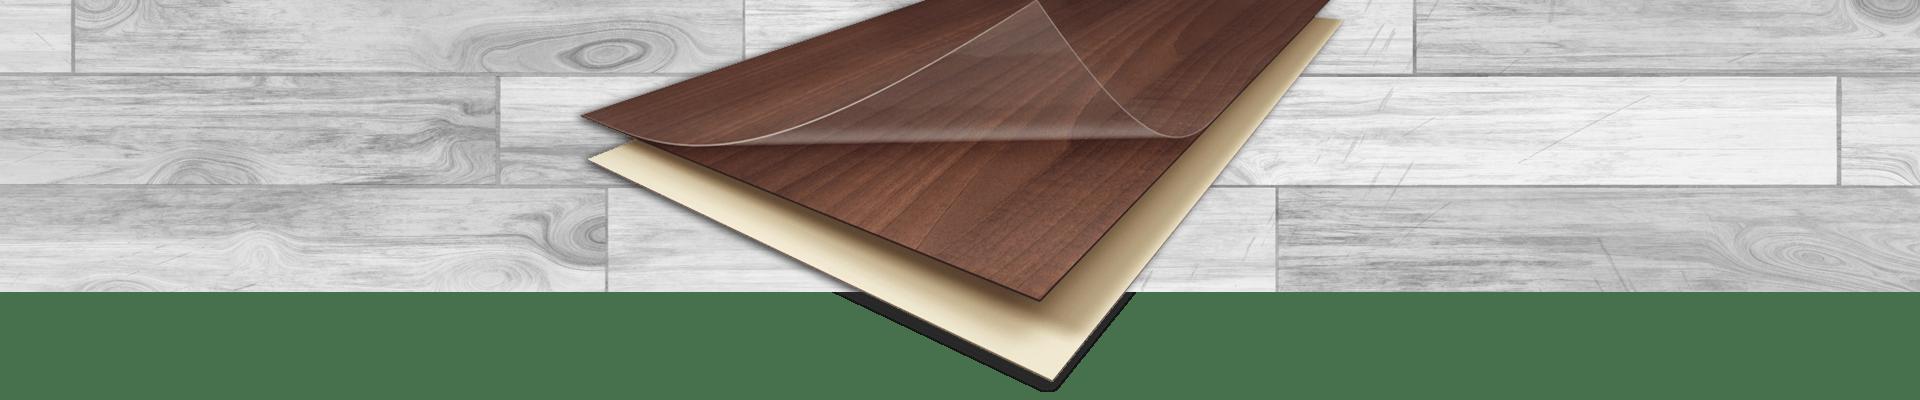 Monavé Laminate Flooring Products